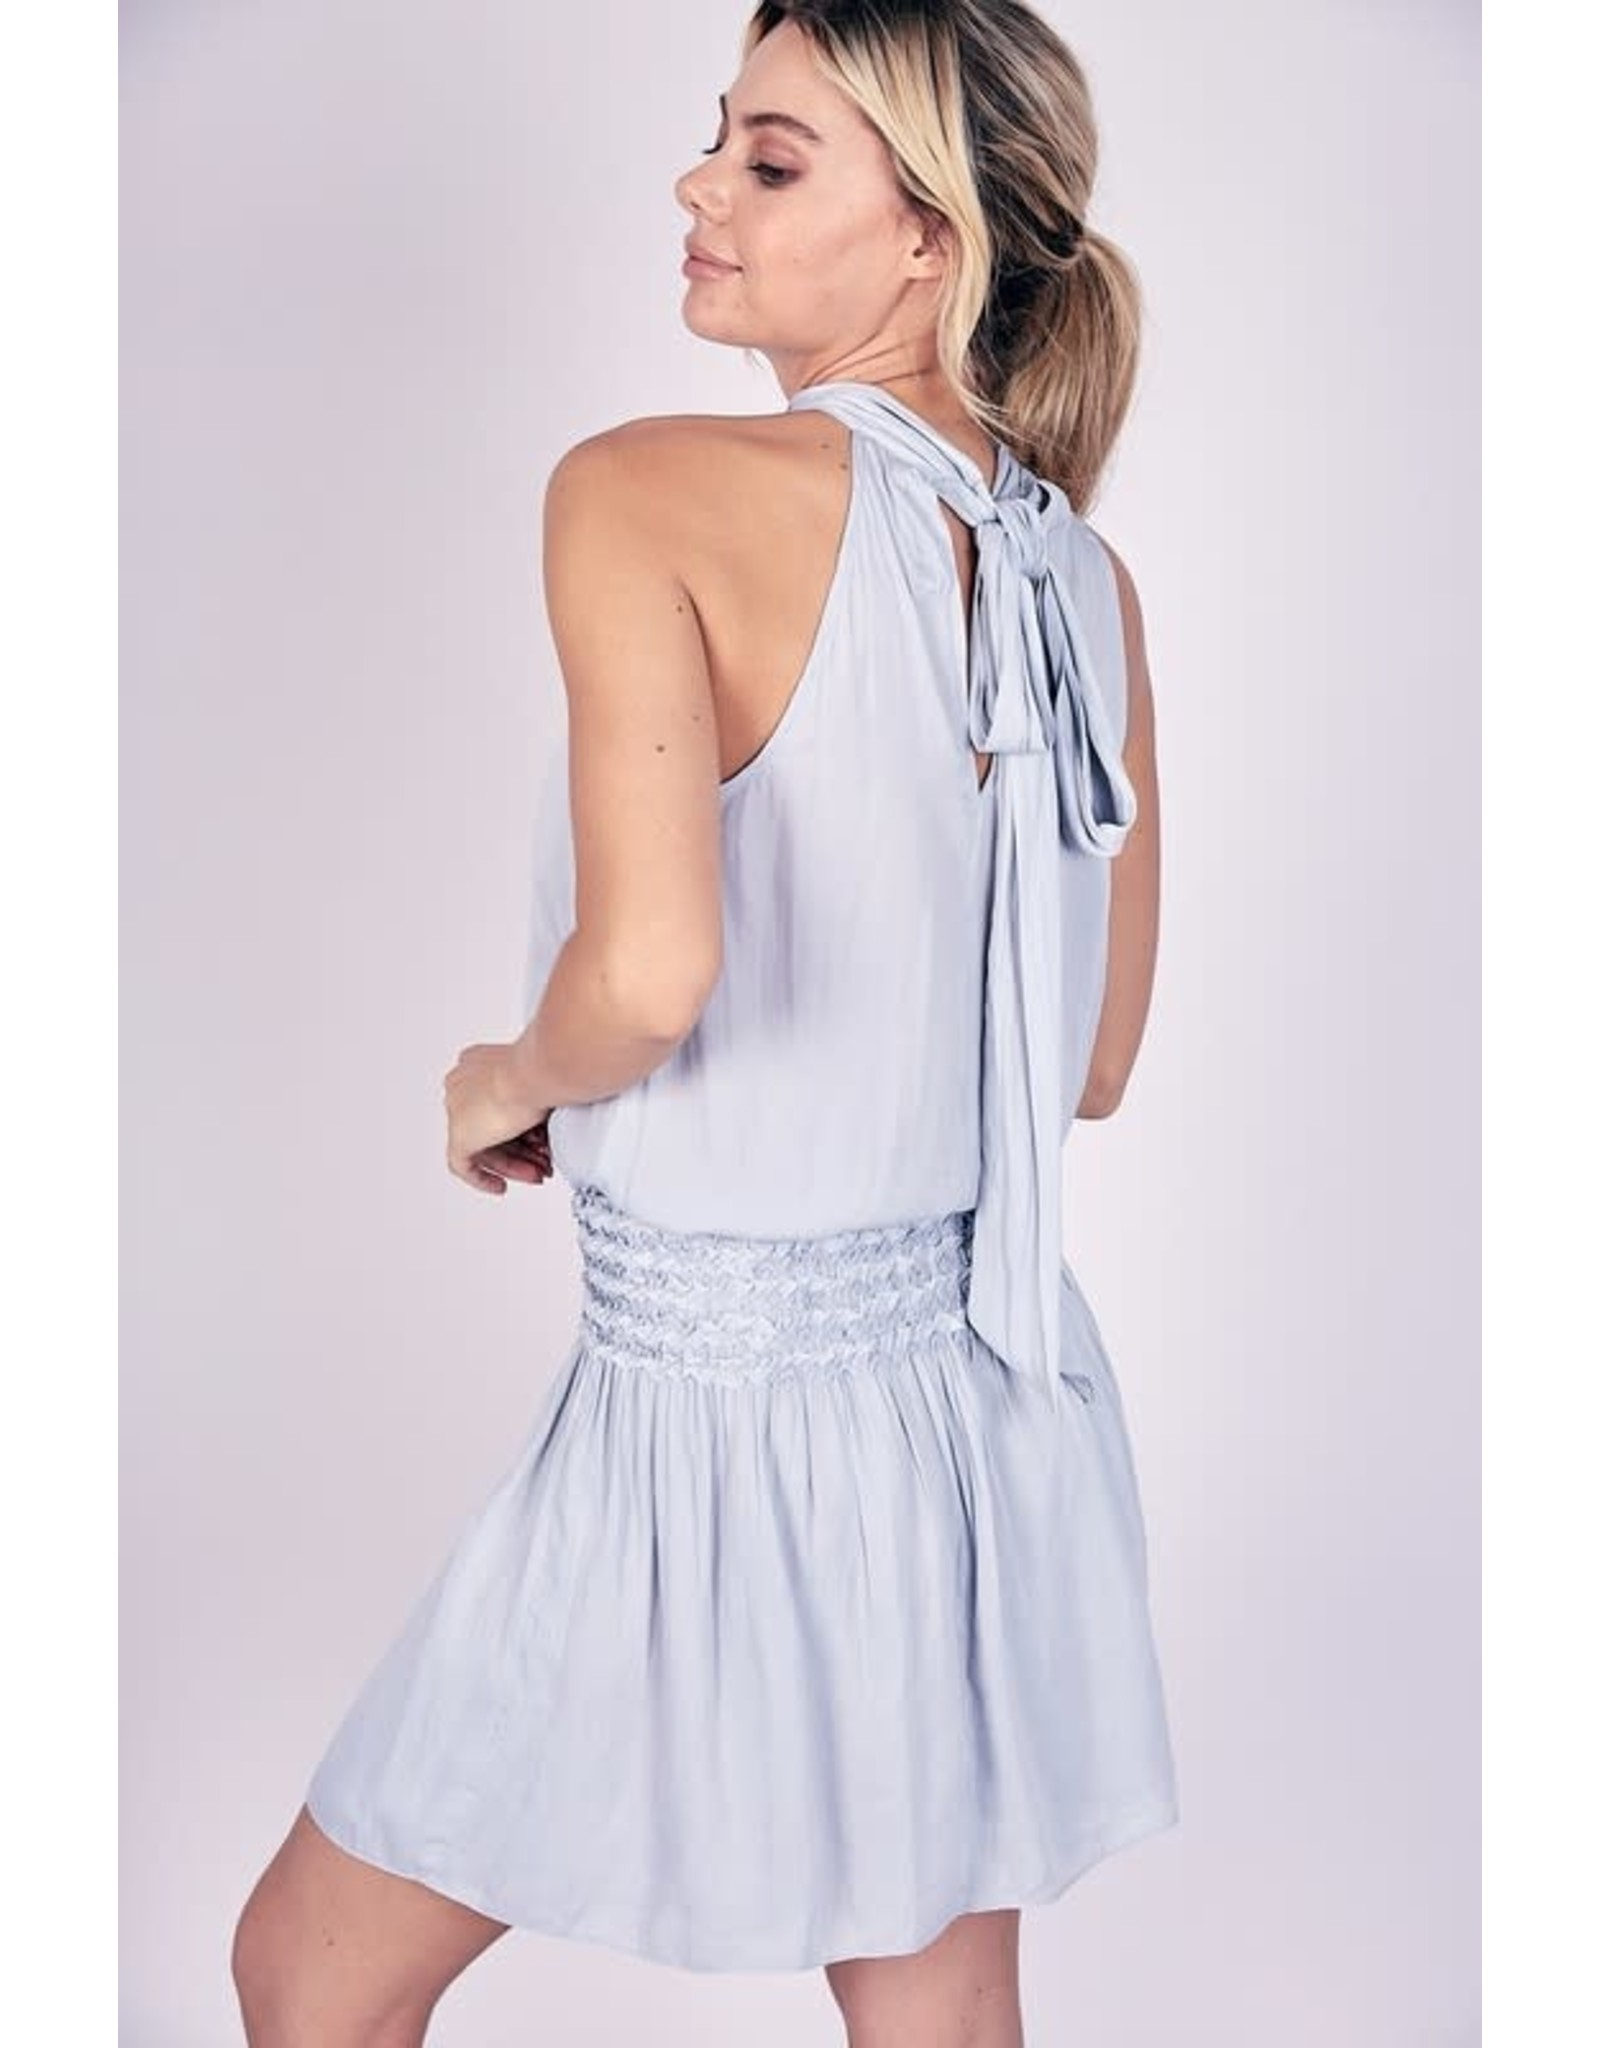 Dance With Me Dress